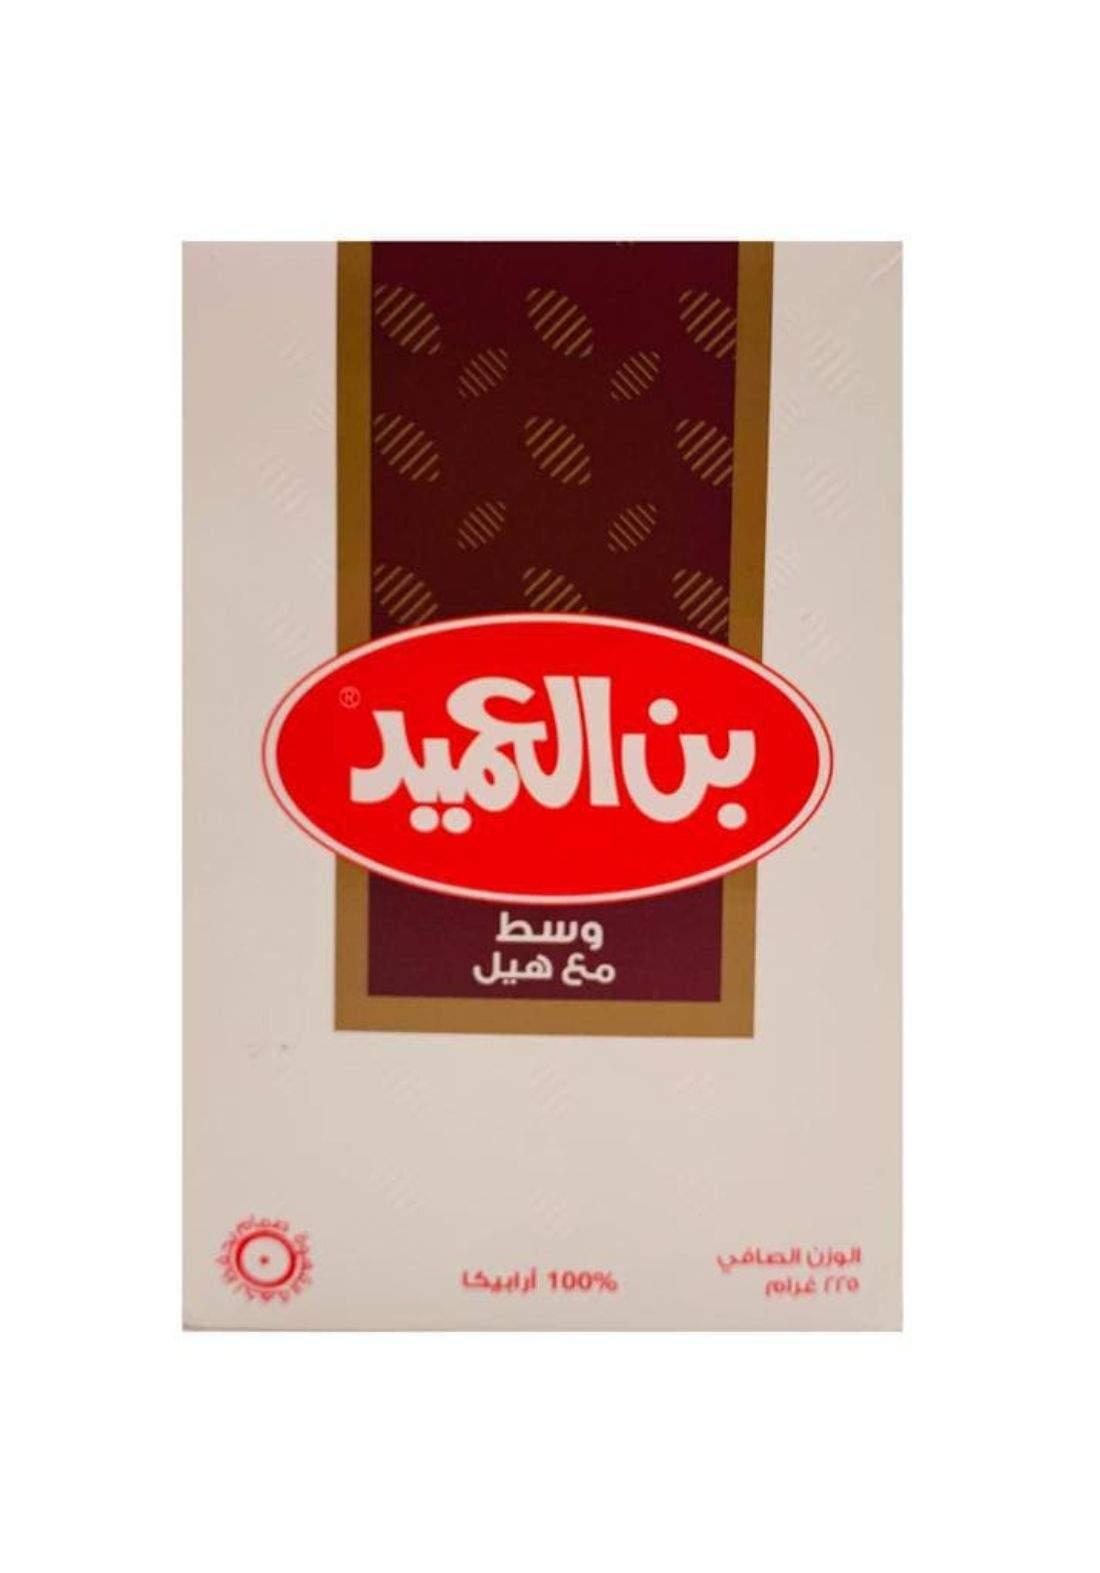 Alameed coffee 225g بن العميد